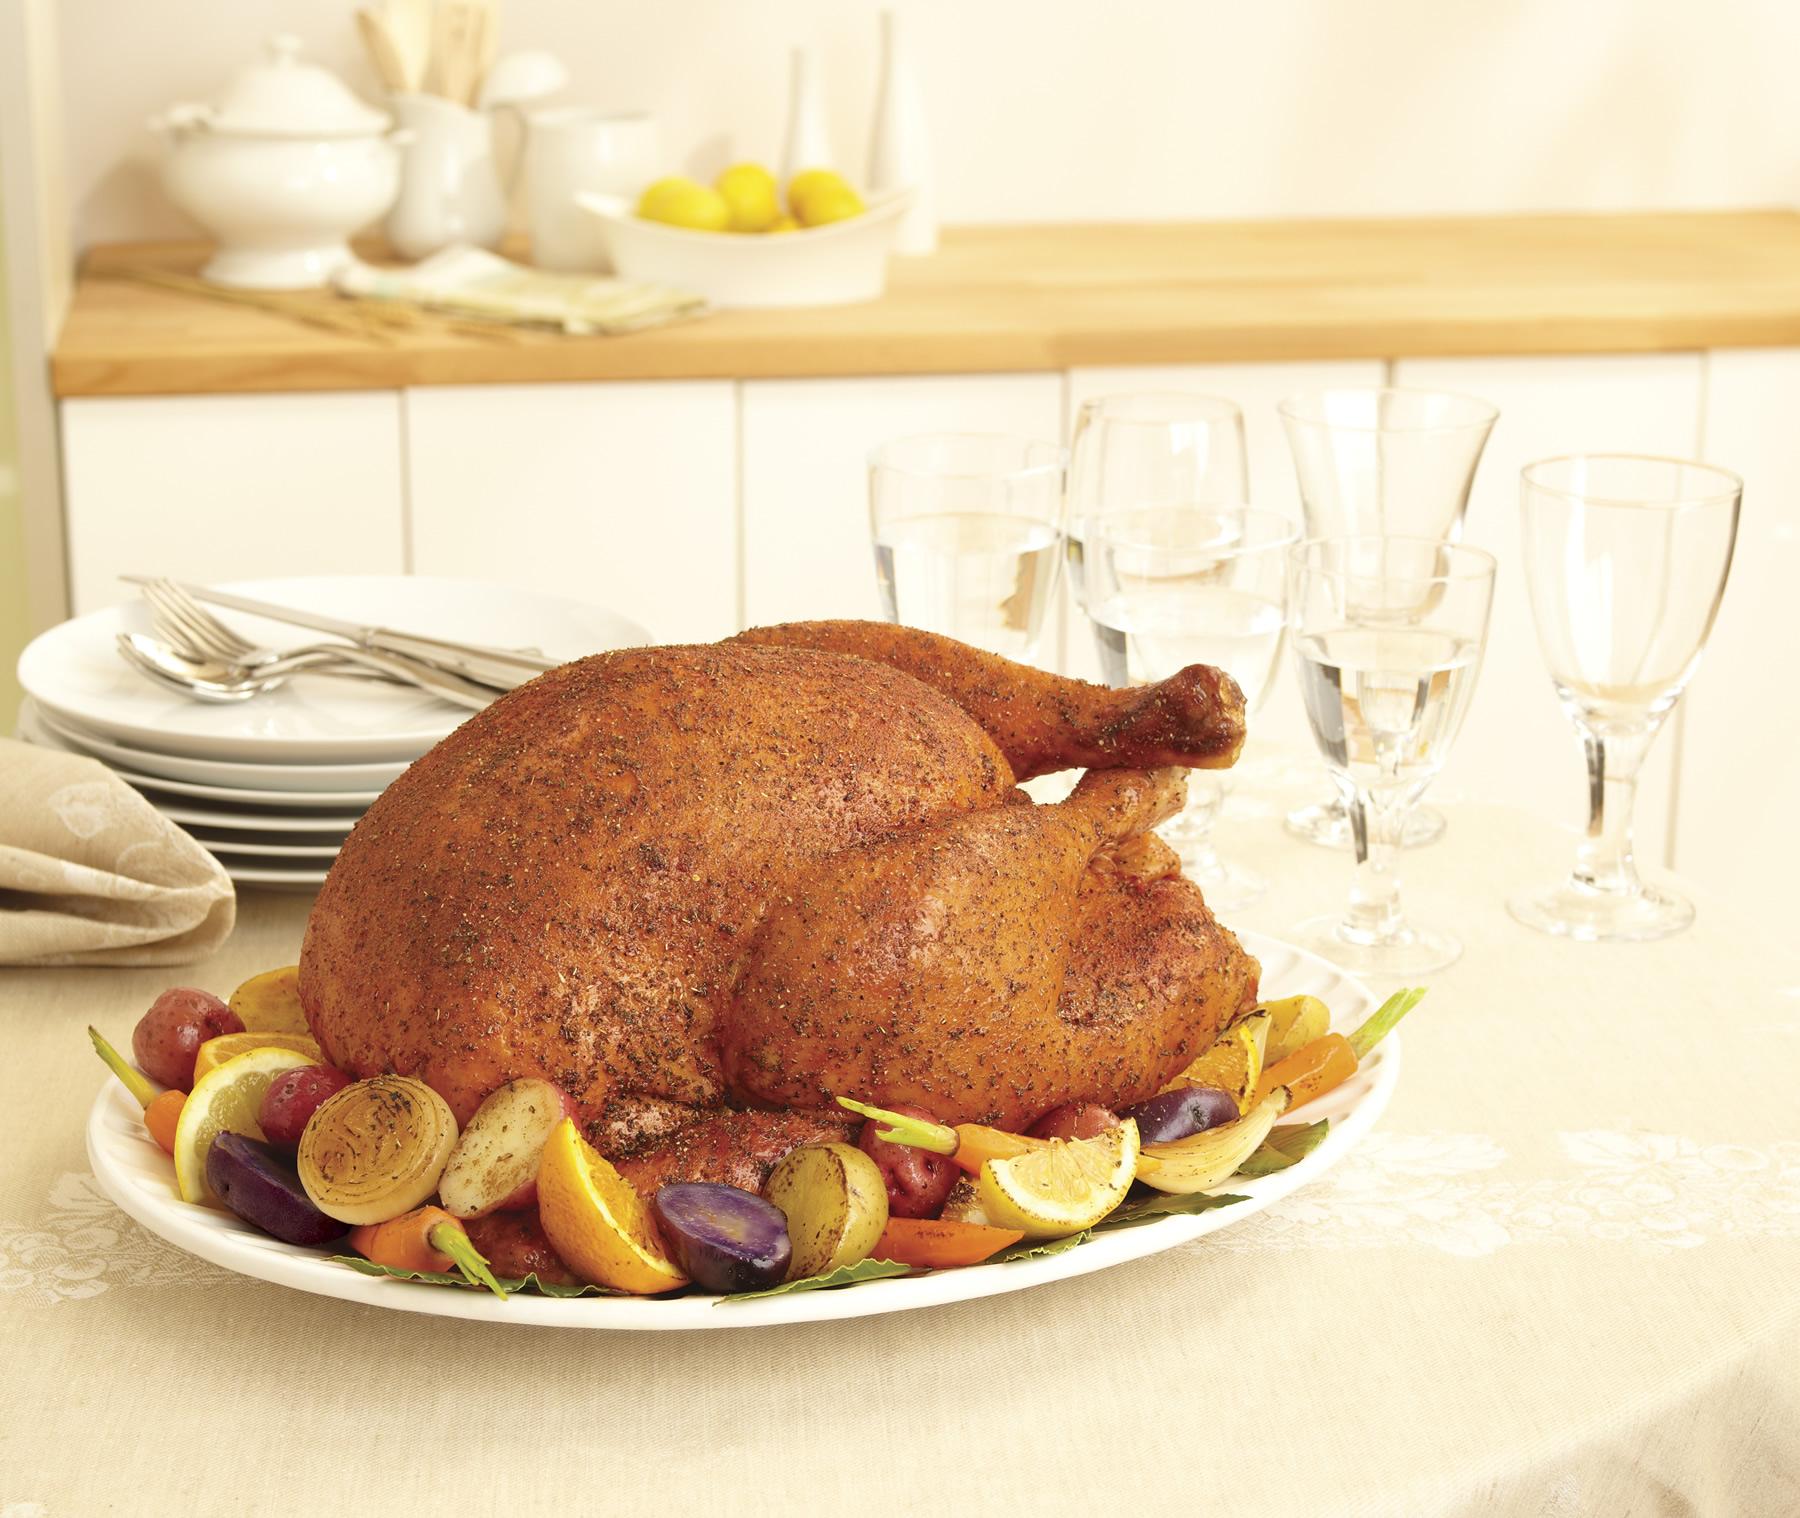 Savory Herb Rub Roasted Turkey